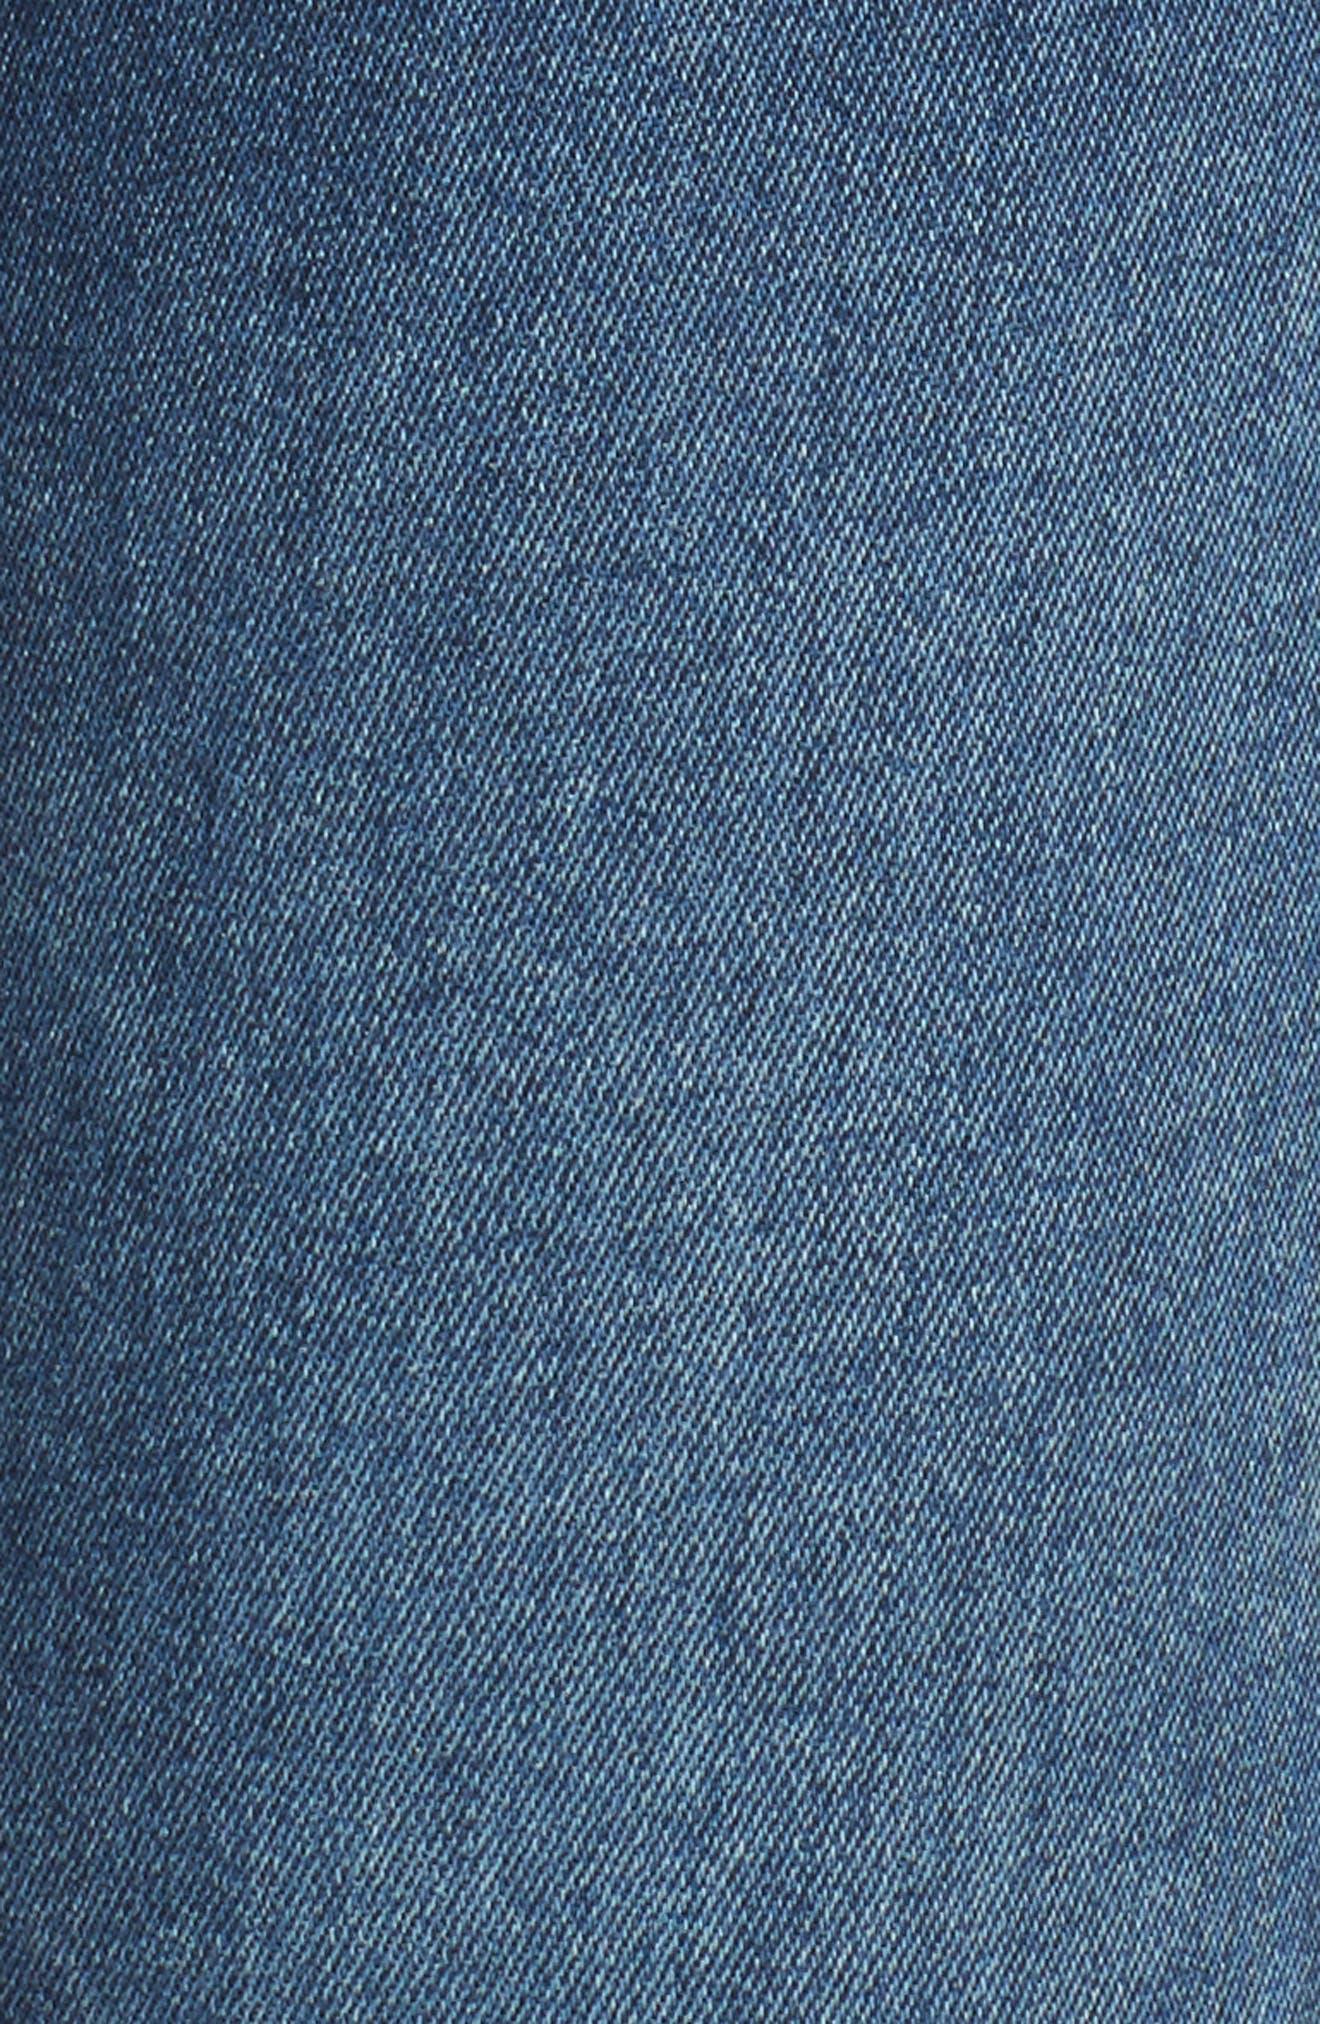 Alternate Image 5  - Fidelity Denim Mila Step Hem Skinny Jeans (Vintage Blue)